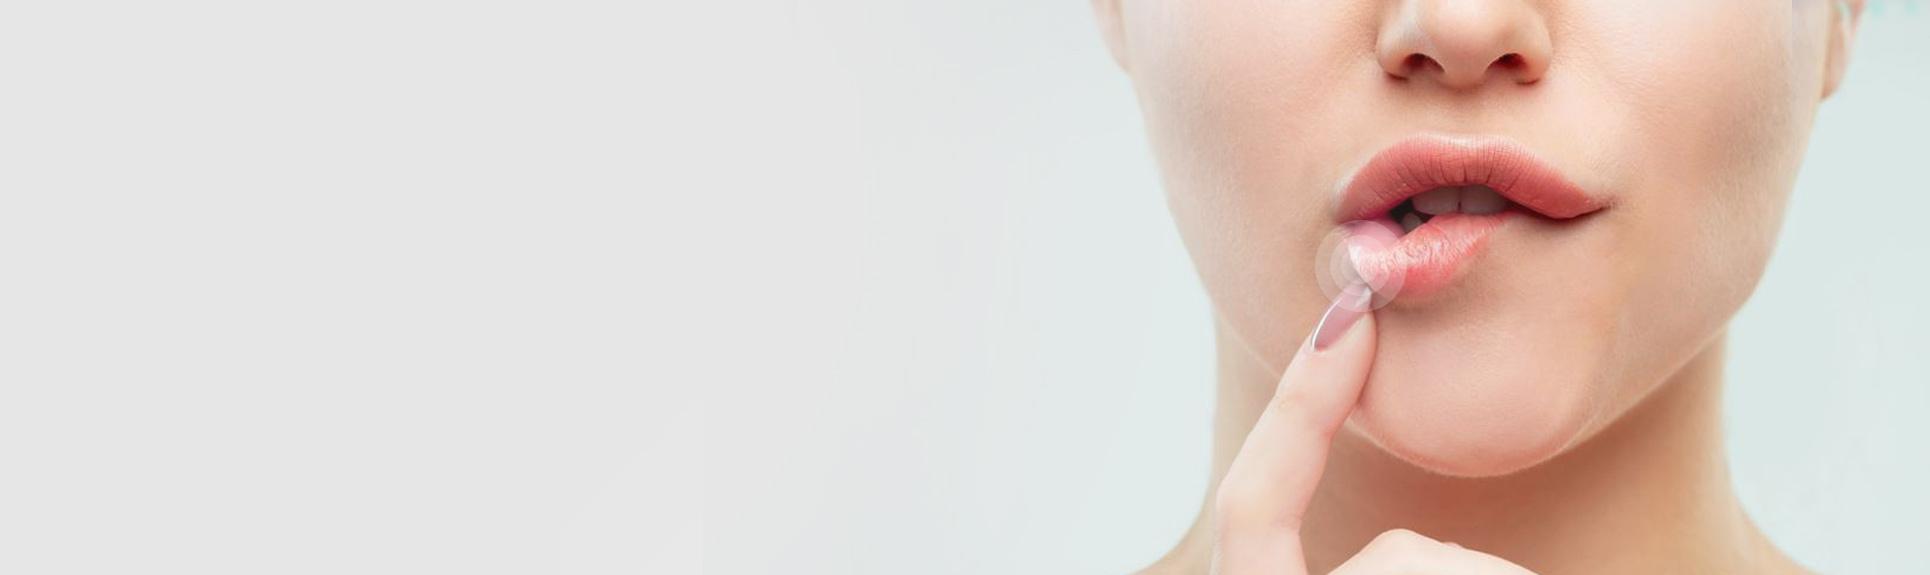 Rimedi per l'Herpes Labiale - Parafarmacia PillolaStore rimedi